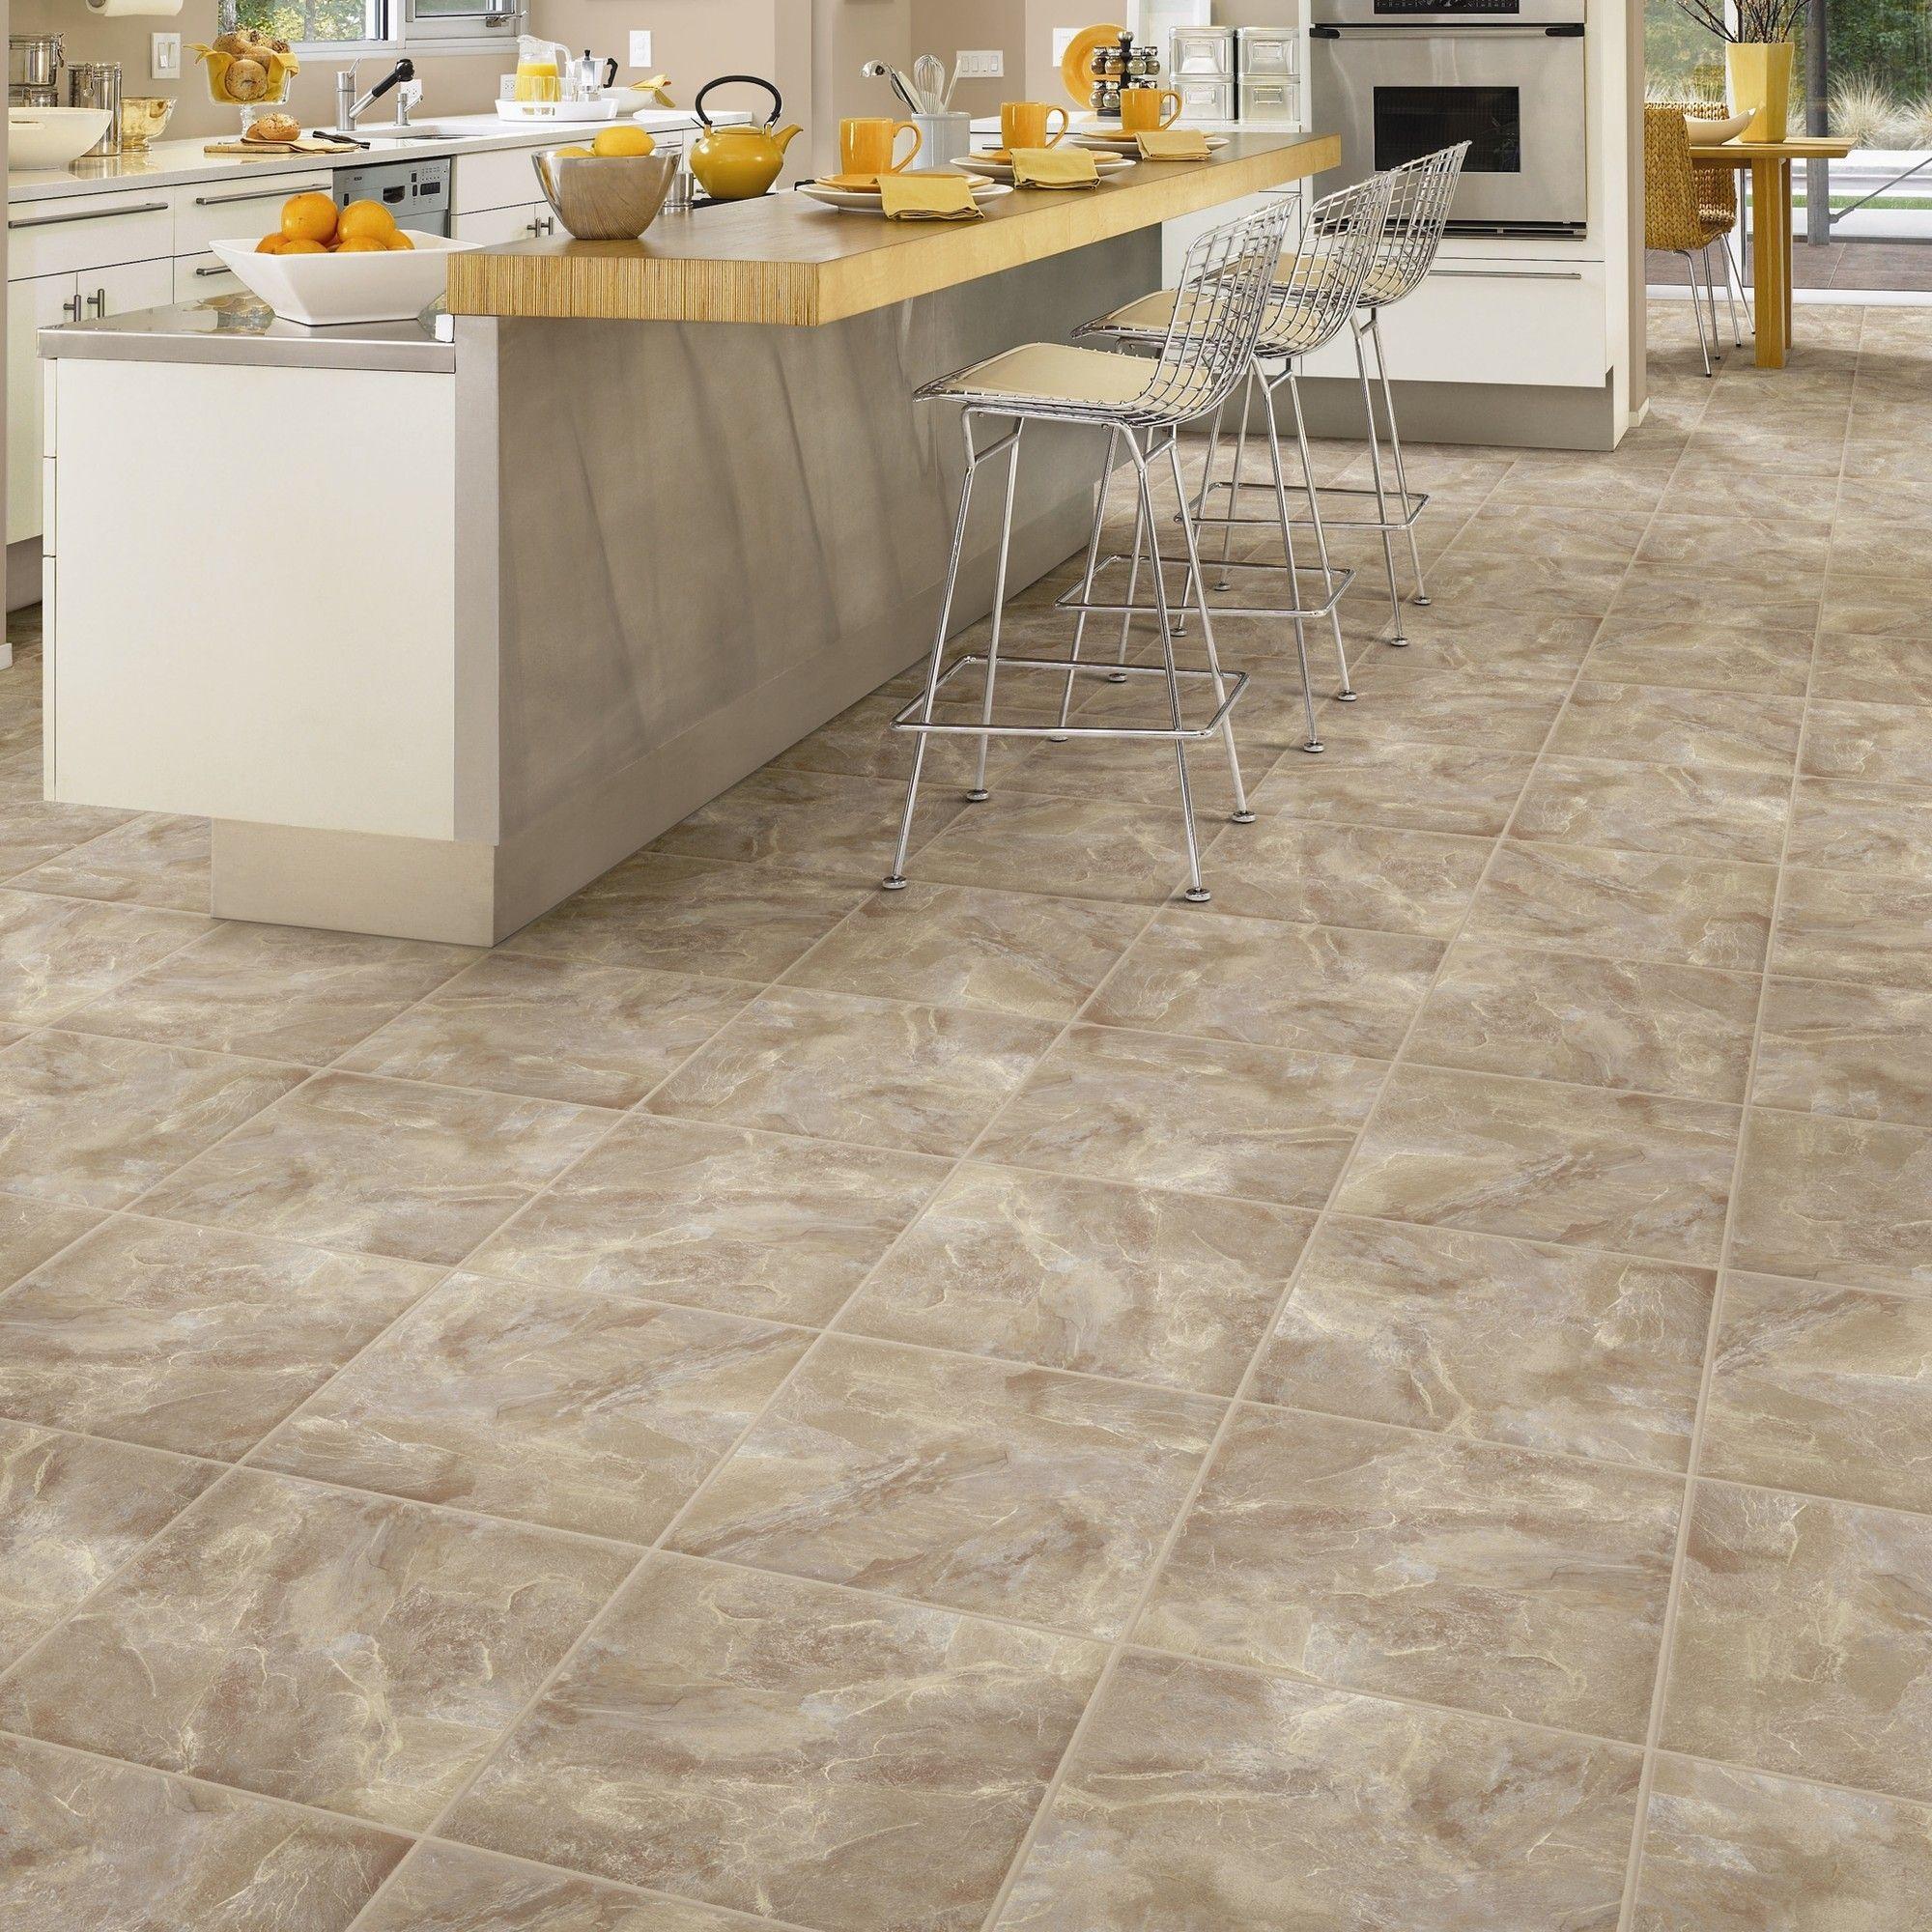 Duraceramic village slate 16 x 16 x 406mm luxury vinyl tile in duraceramic village slate 16 x 16 x 406mm luxury vinyl tile in swanky doublecrazyfo Images